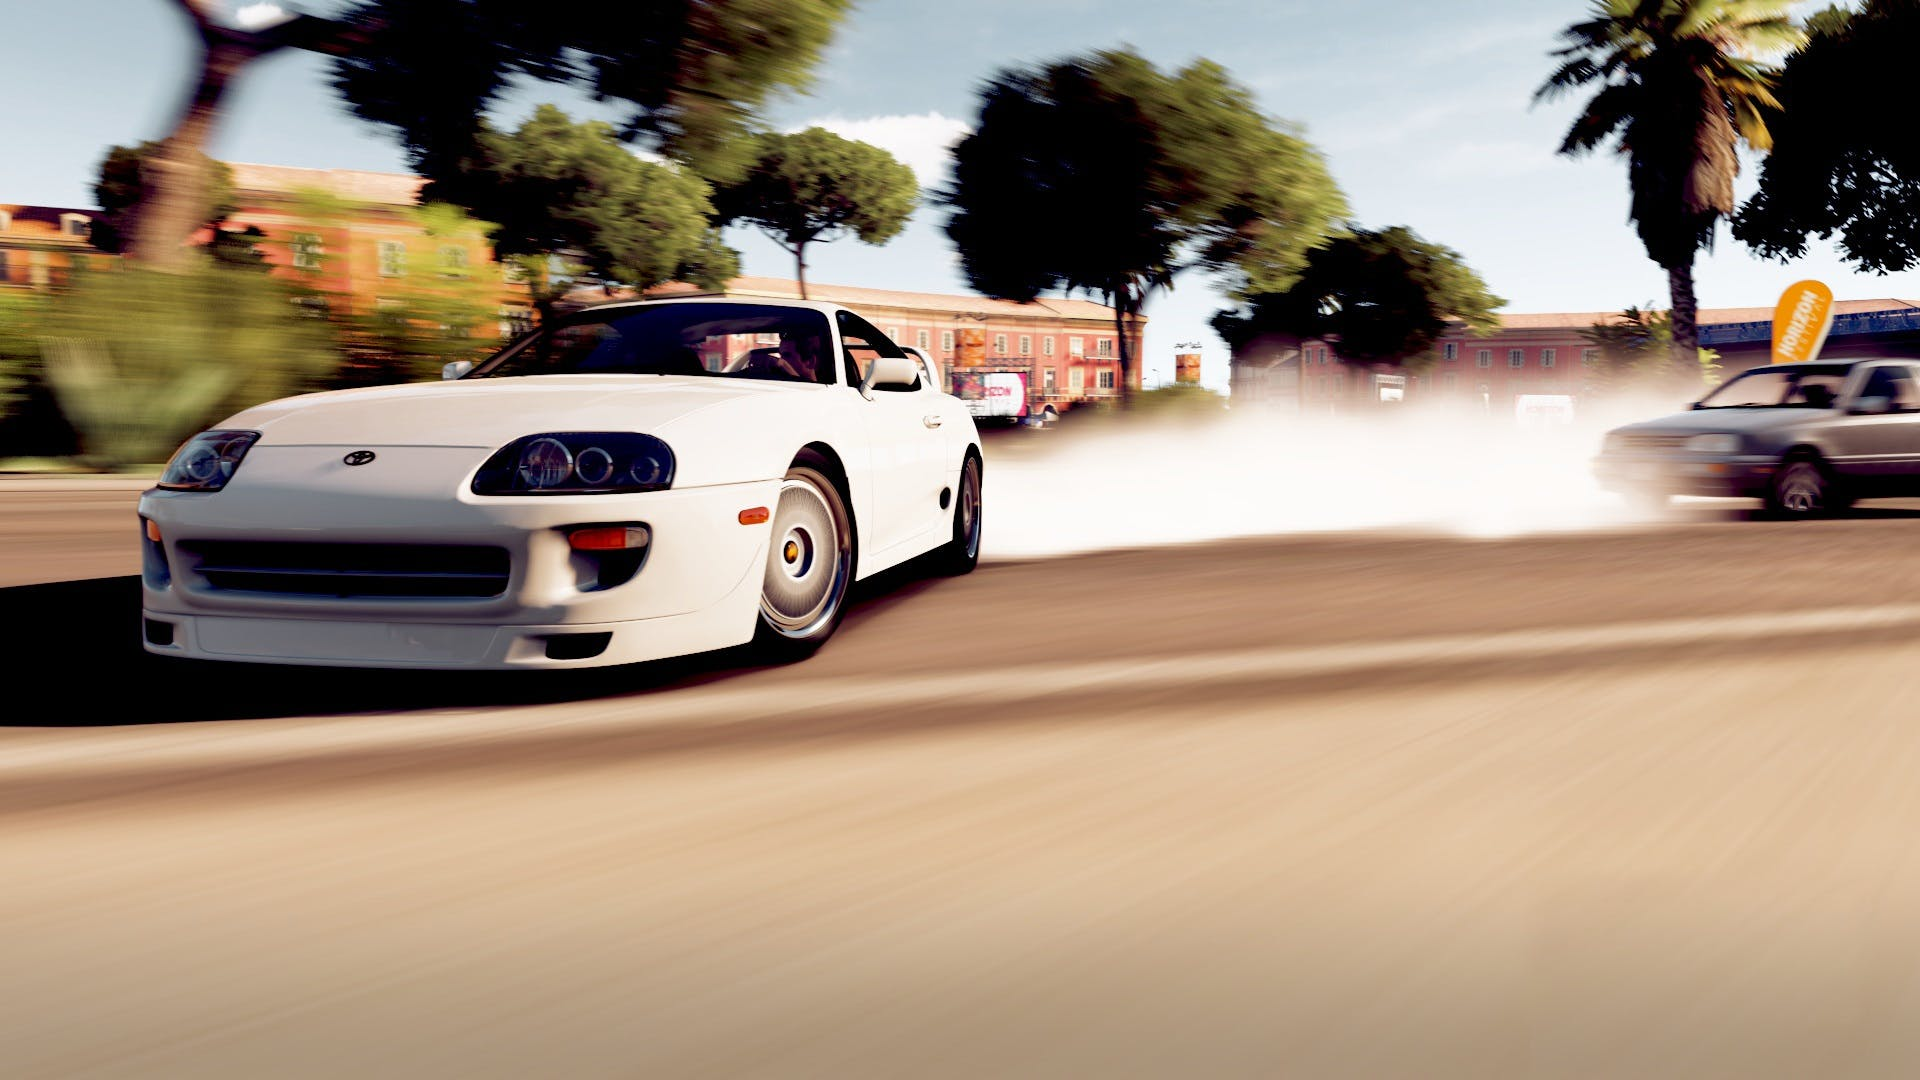 supra drifting